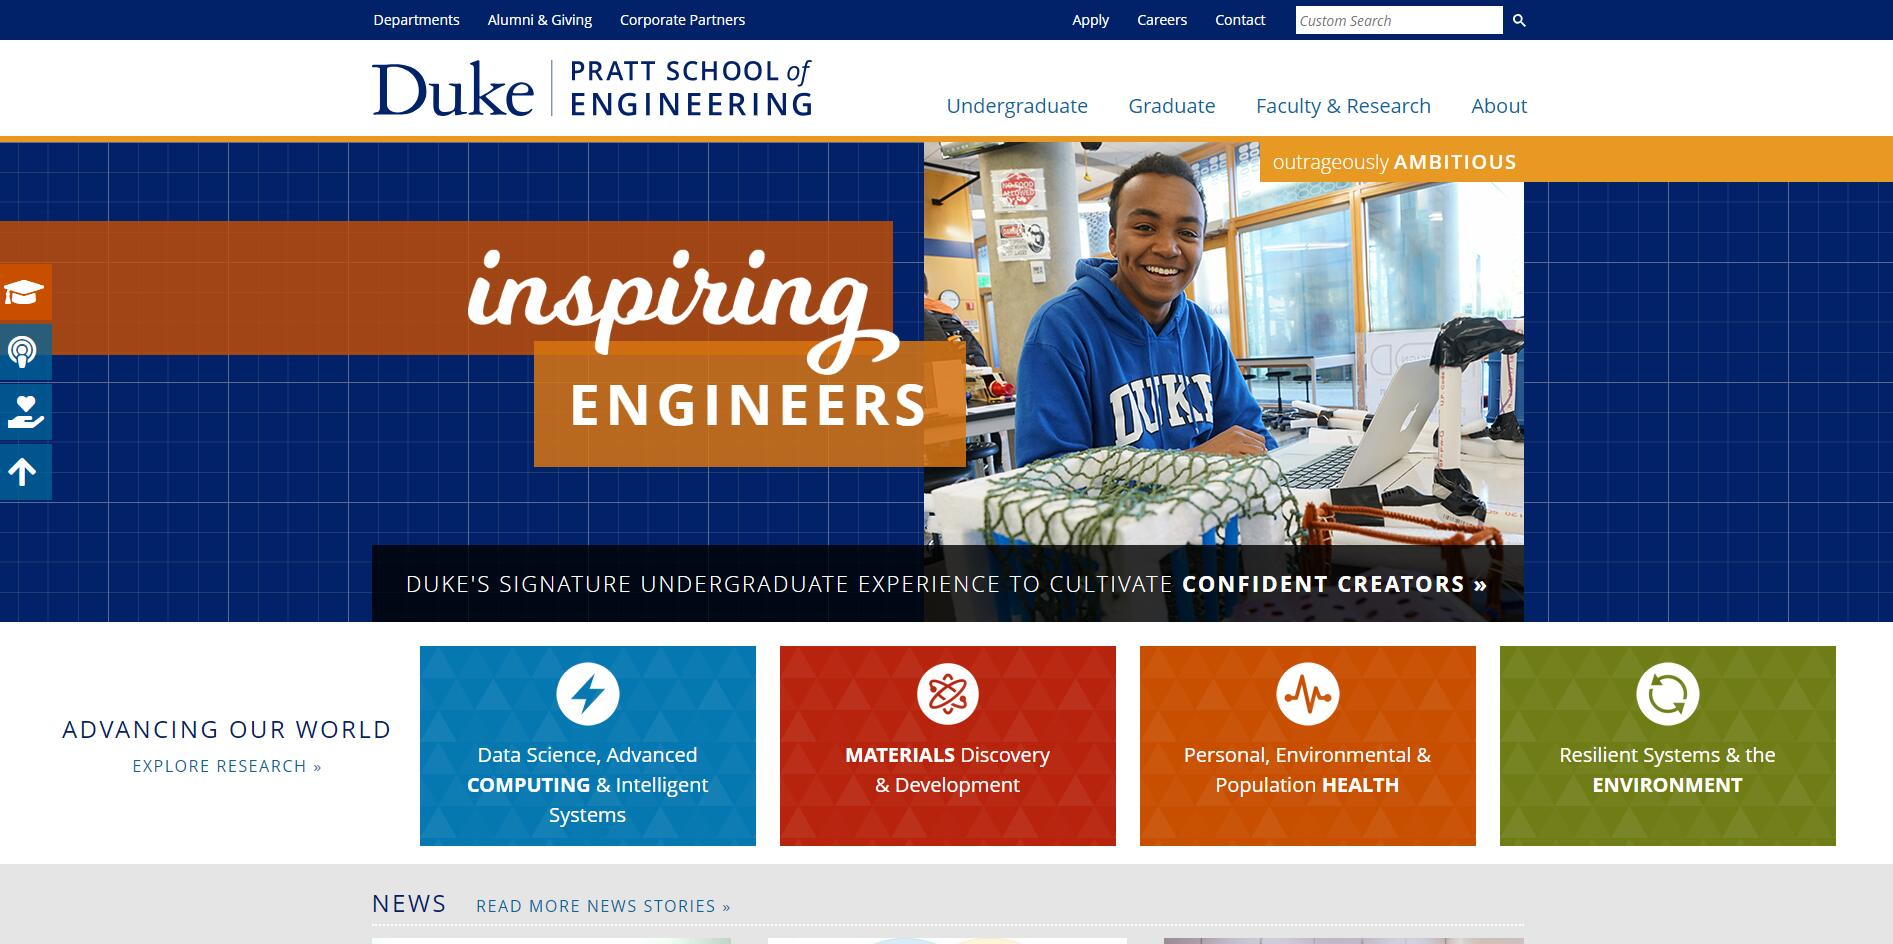 The Pratt School of Engineering at Duke University